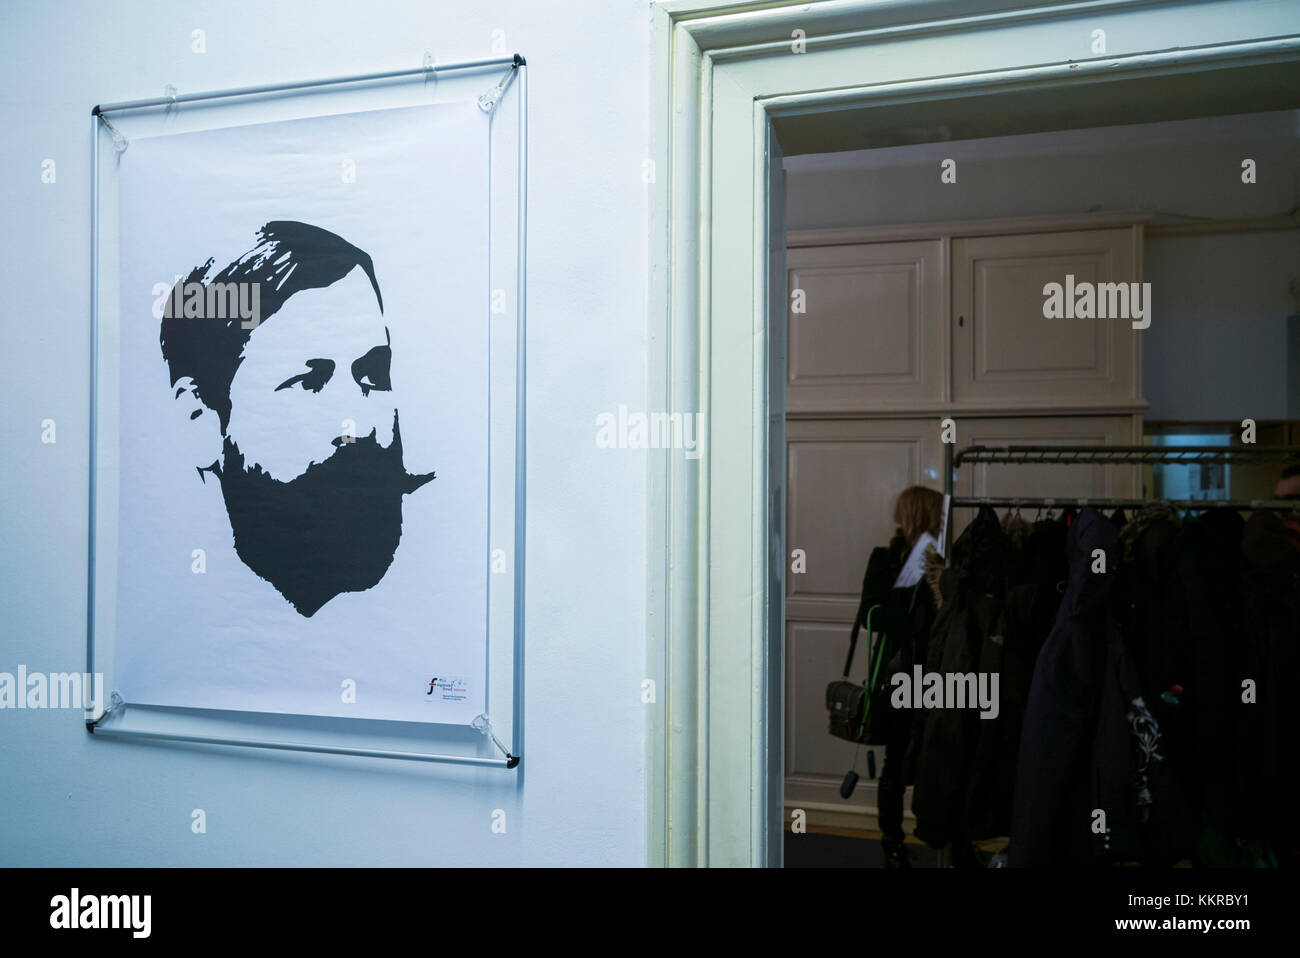 Austria, Vienna, Sigmund Freud Museum, interior - Stock Image